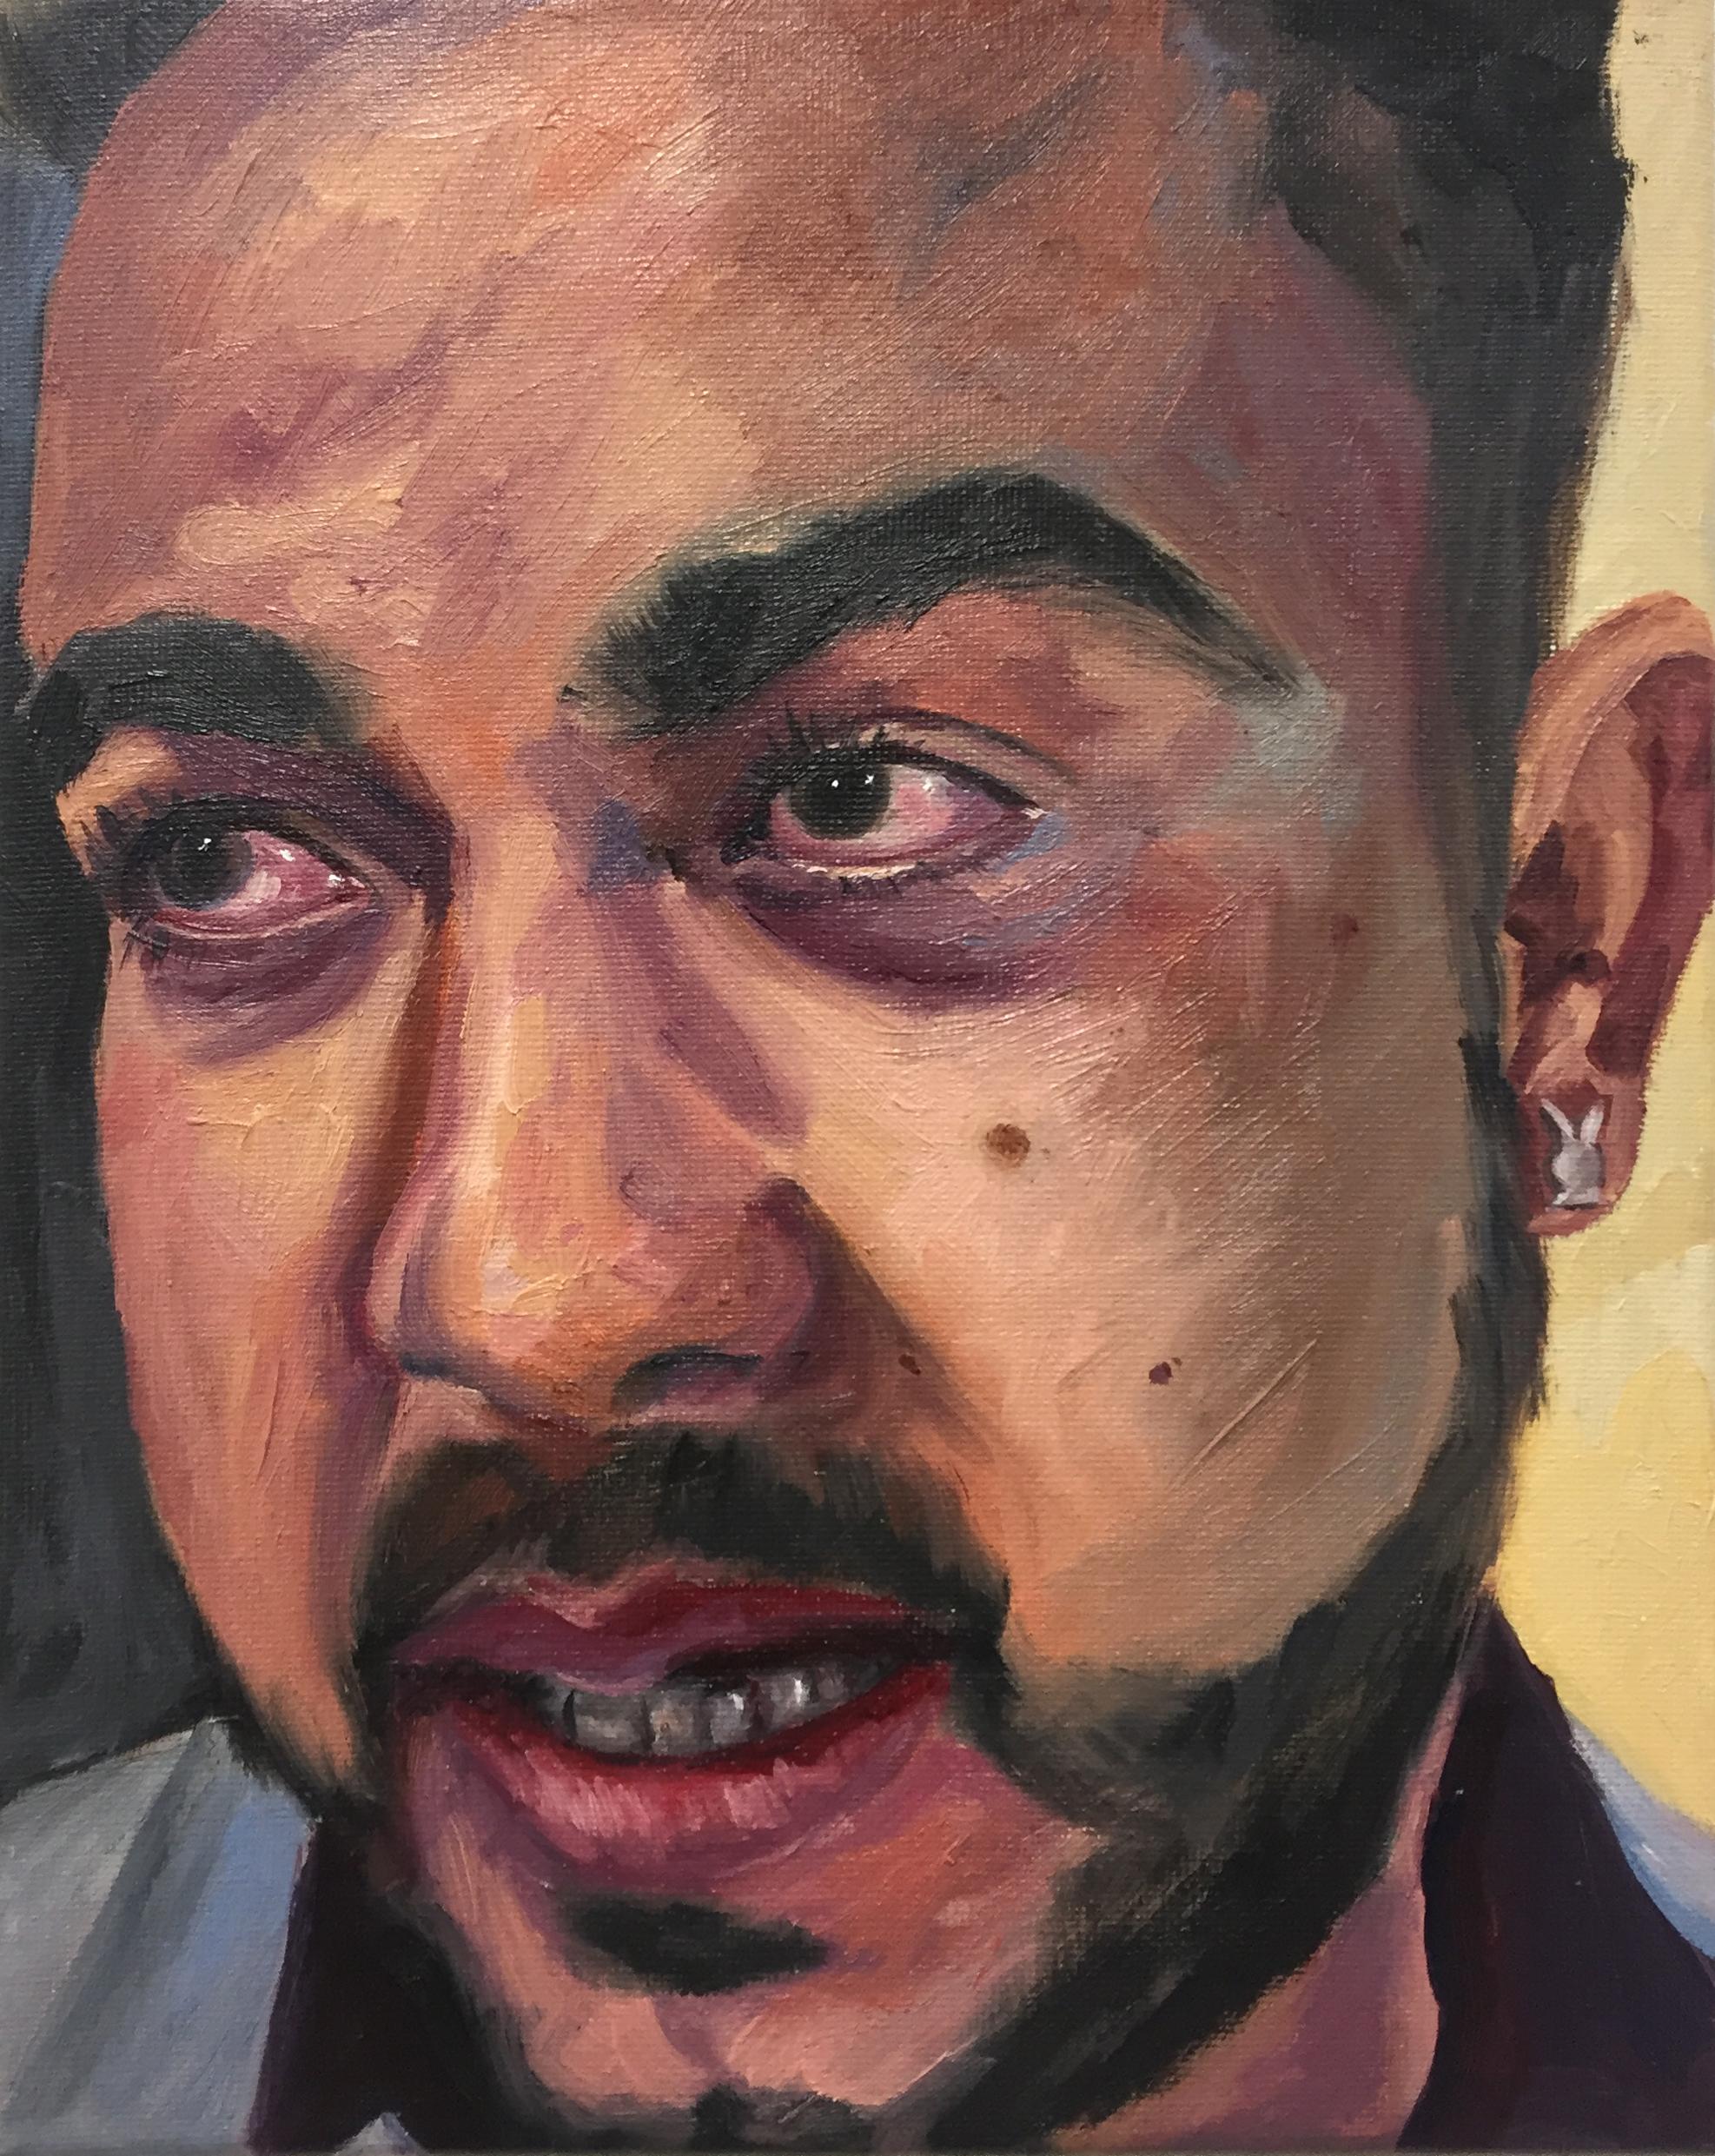 Drunk-Portrait-#4 Carlos-oiloncanvas_8x10__2018.jpg